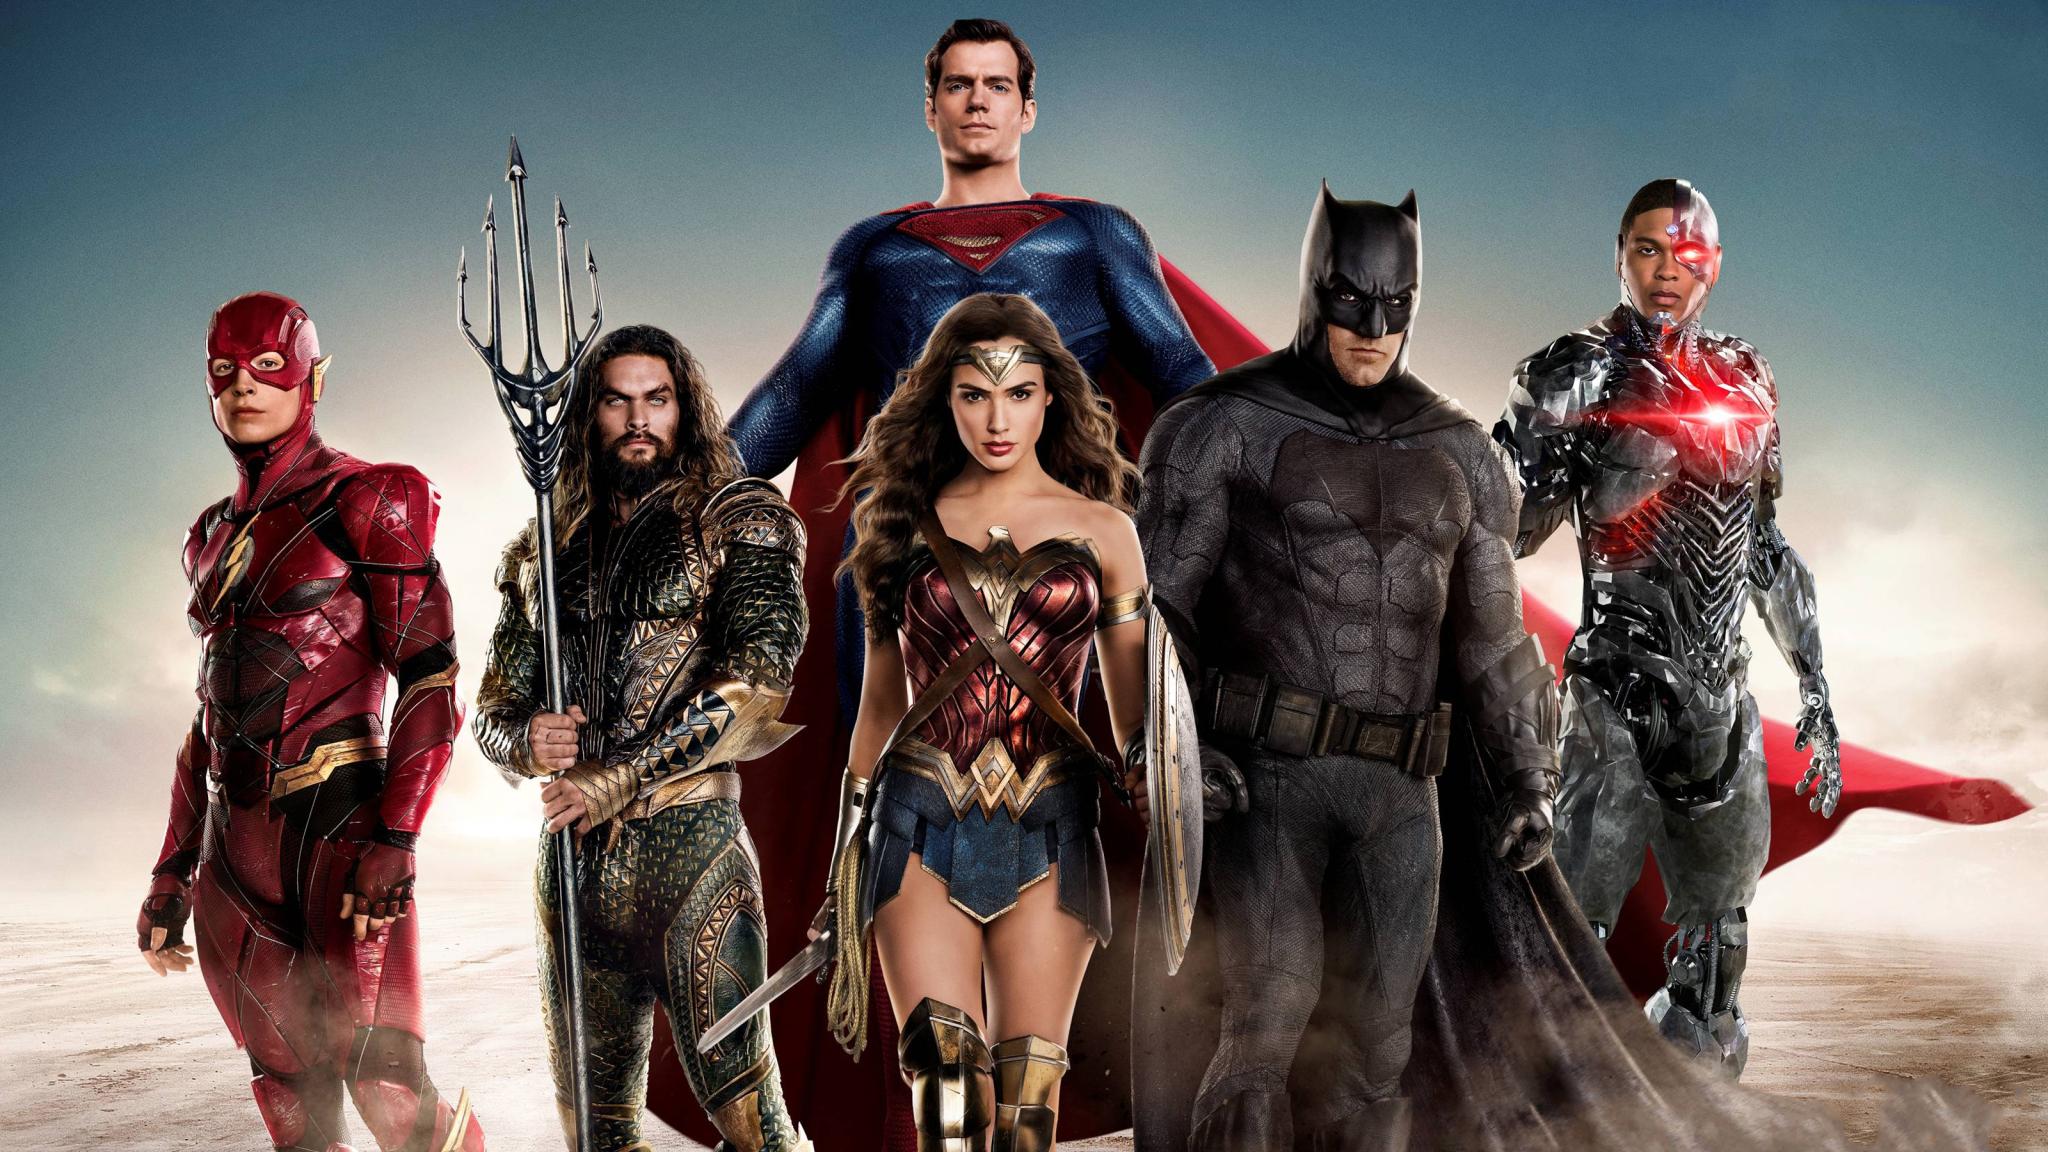 Justice League 2017 Movie 4k Hd Desktop Wallpaper For 4k: Justice League 2017, HD 4K Wallpaper